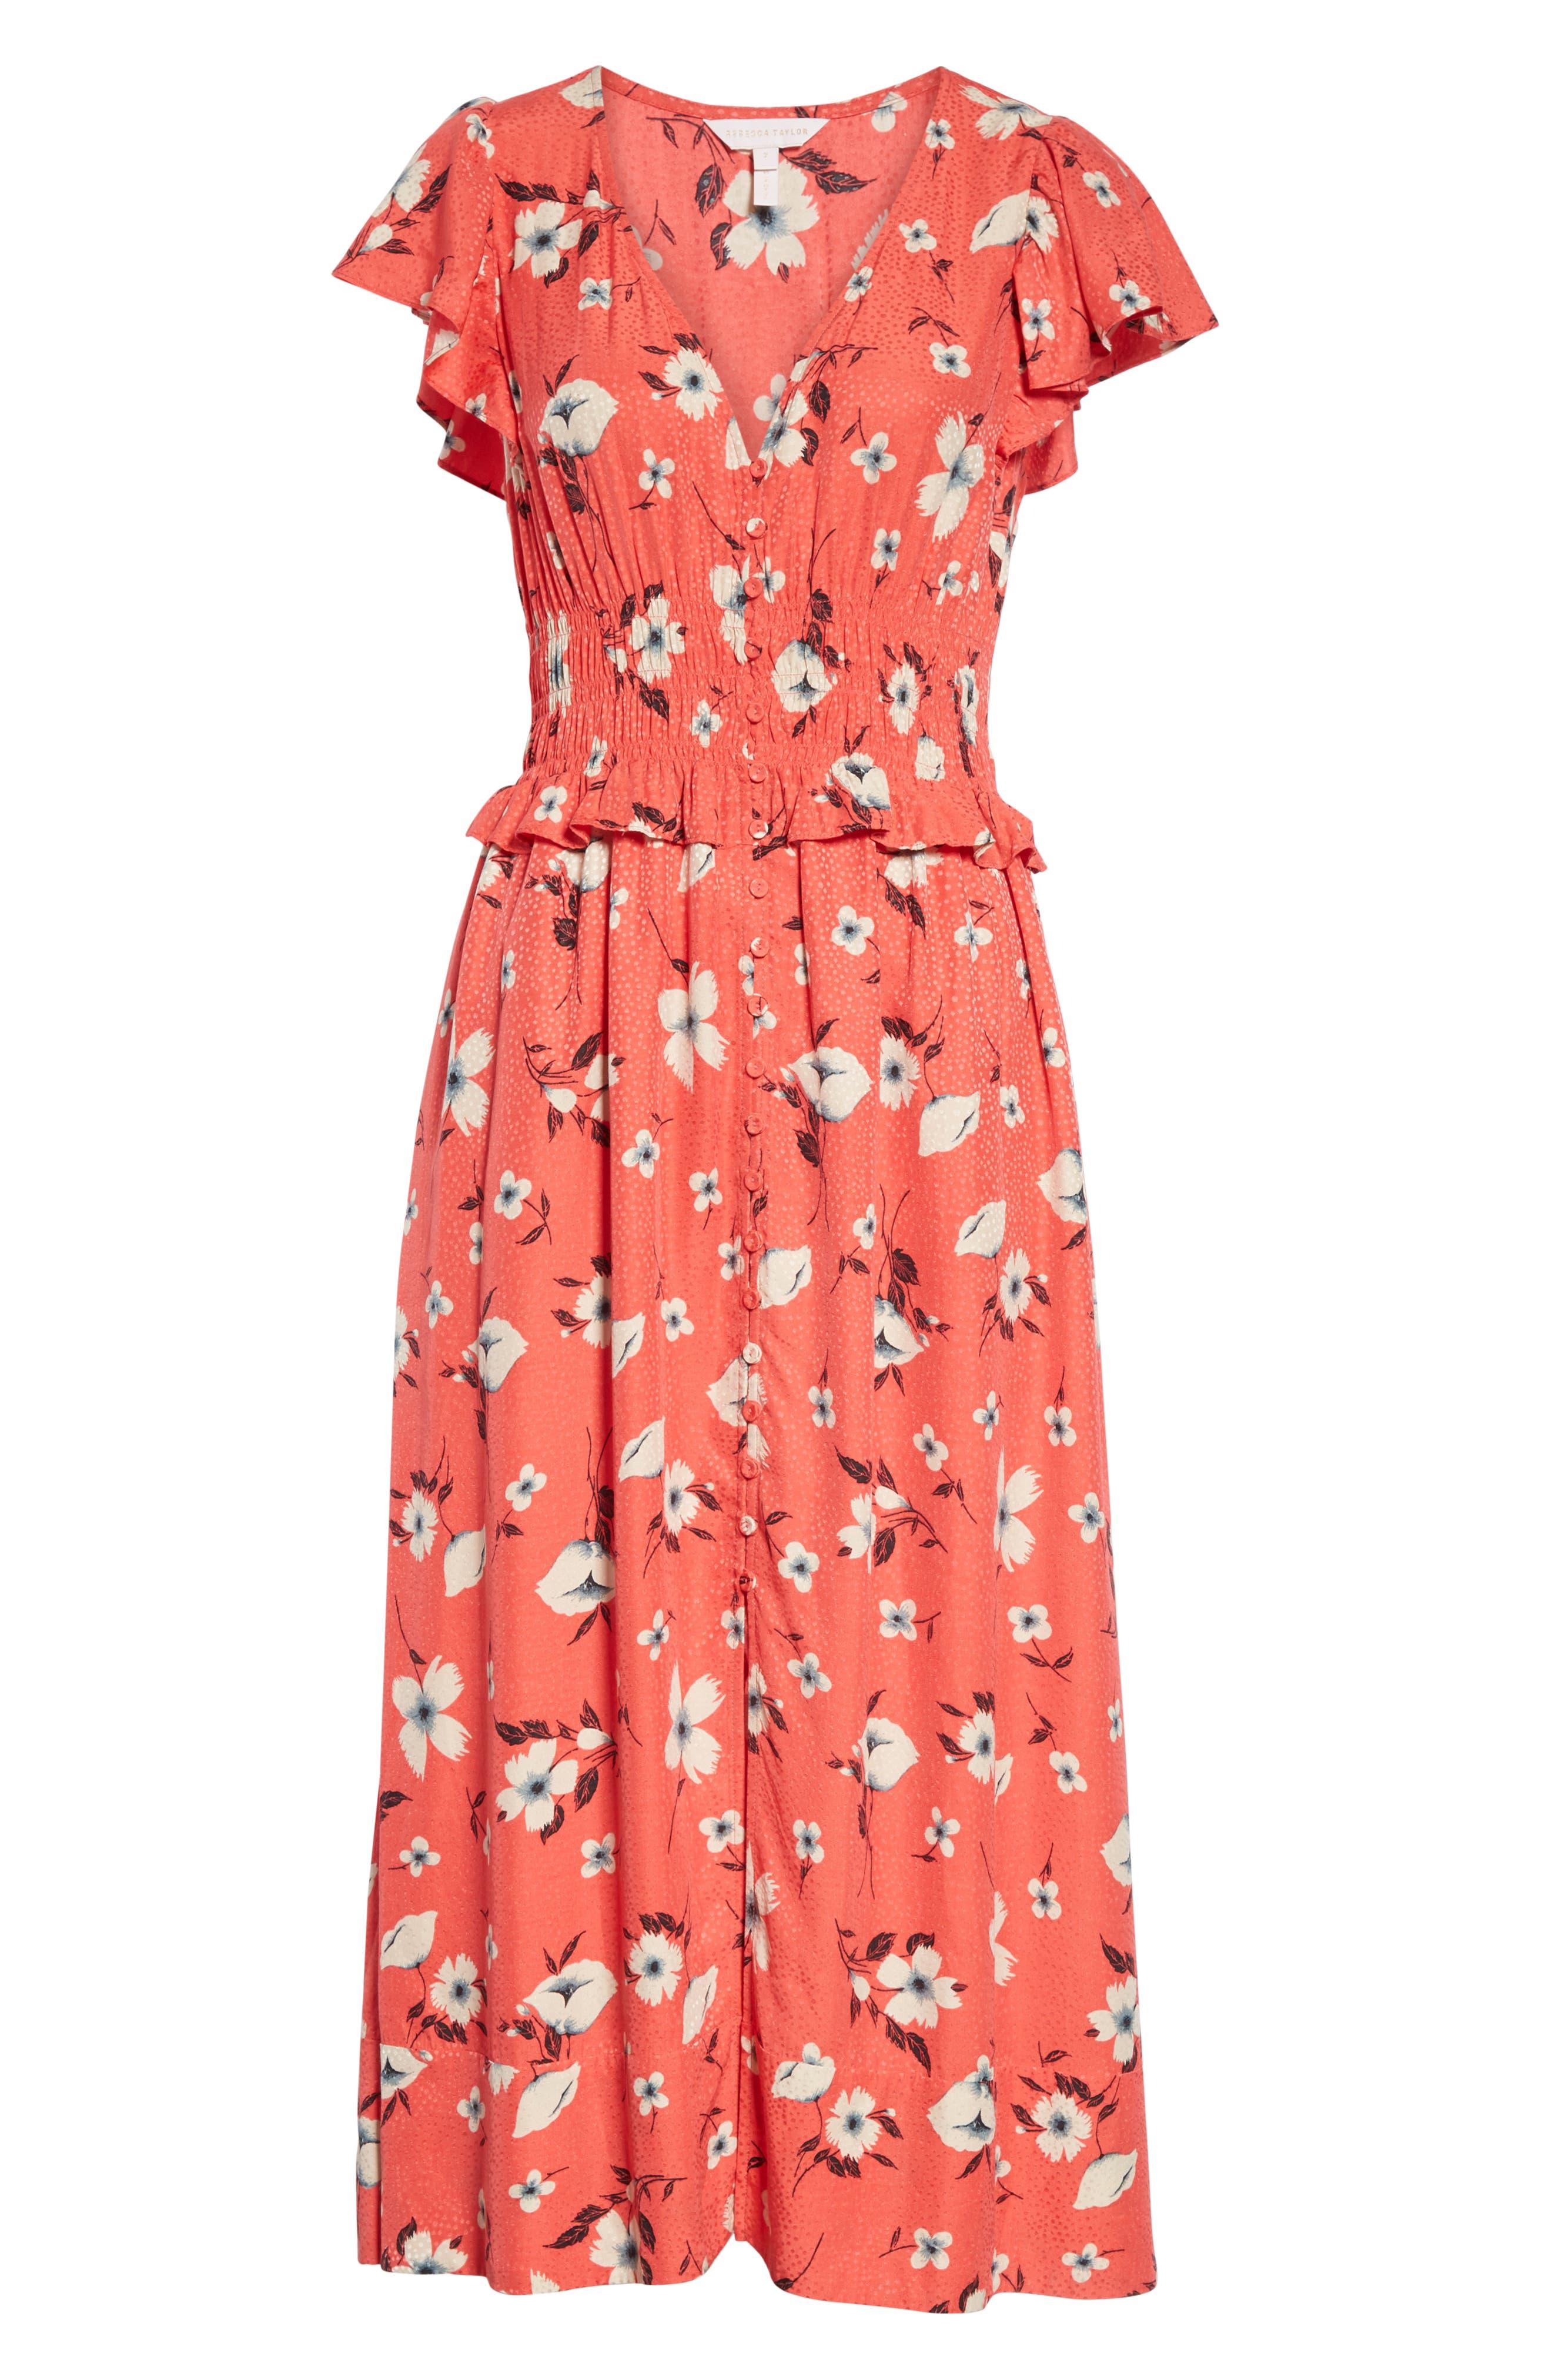 REBECCA TAYLOR, Daniella Floral Jacquard Silk Blend Dress, Alternate thumbnail 7, color, PUNCH COMBO